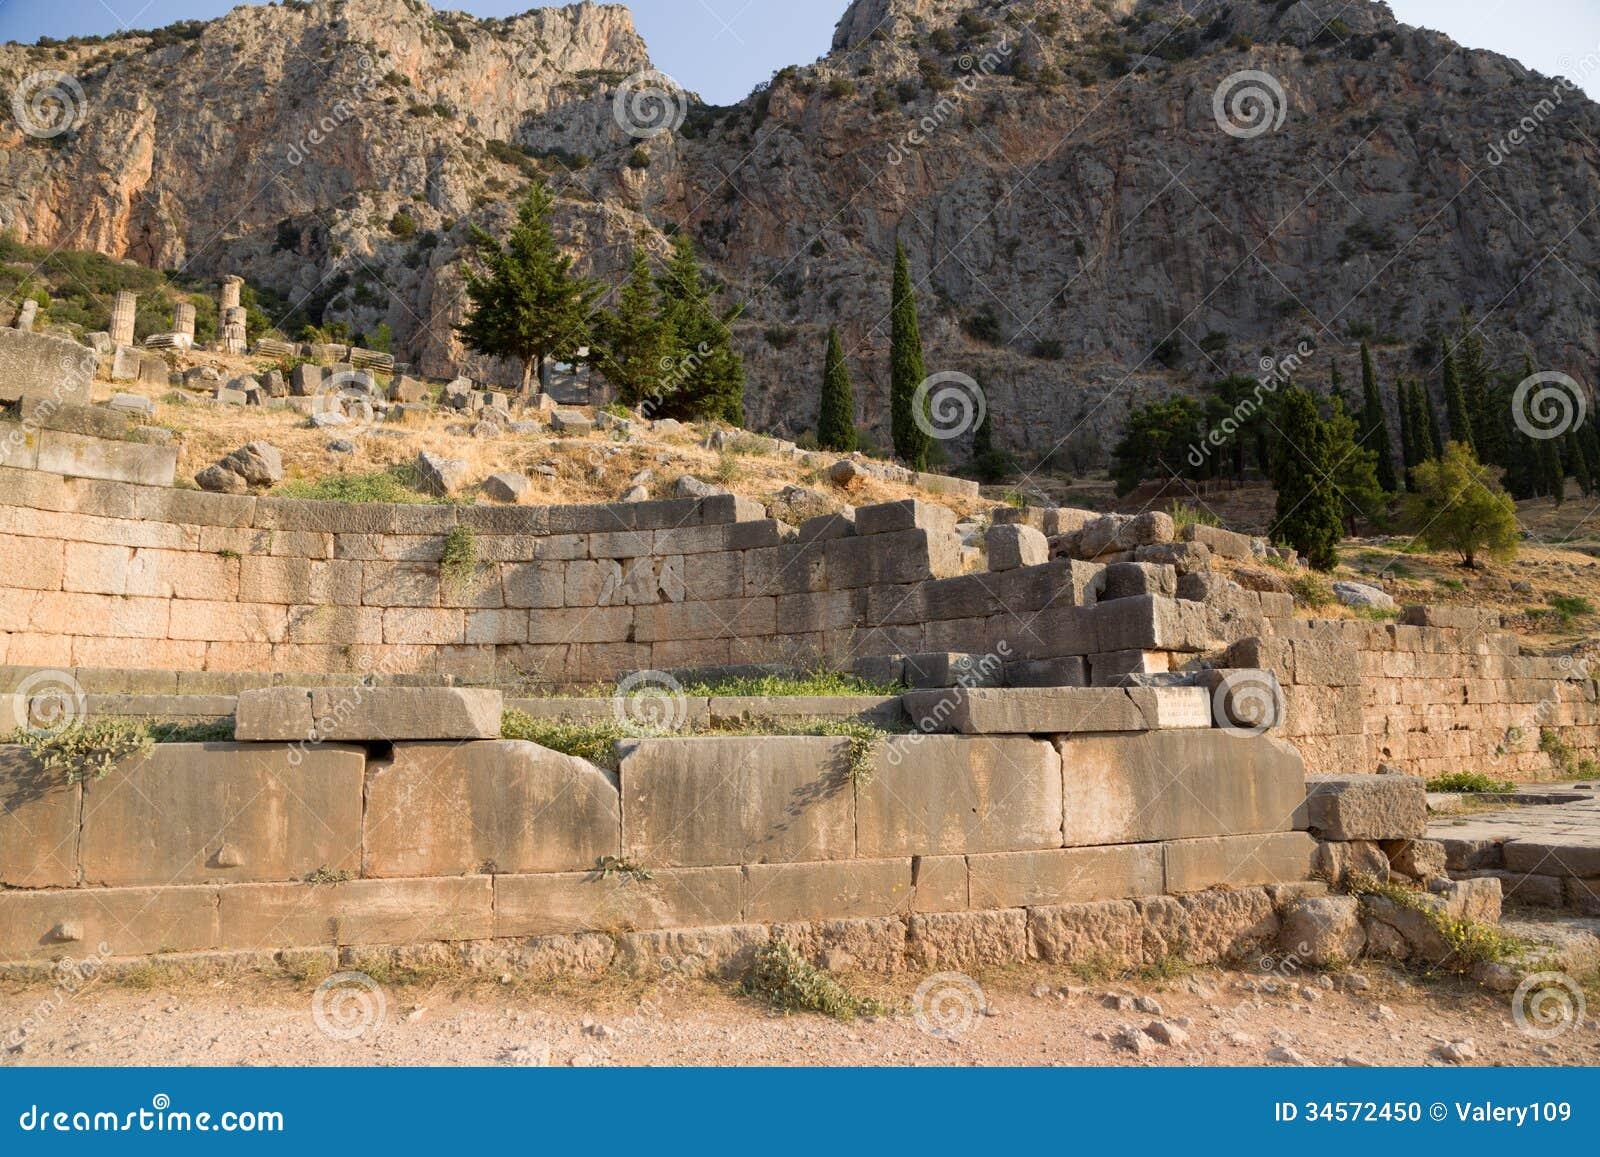 Greece. Delphi. Ruins Stock Photo - Image: 34572450